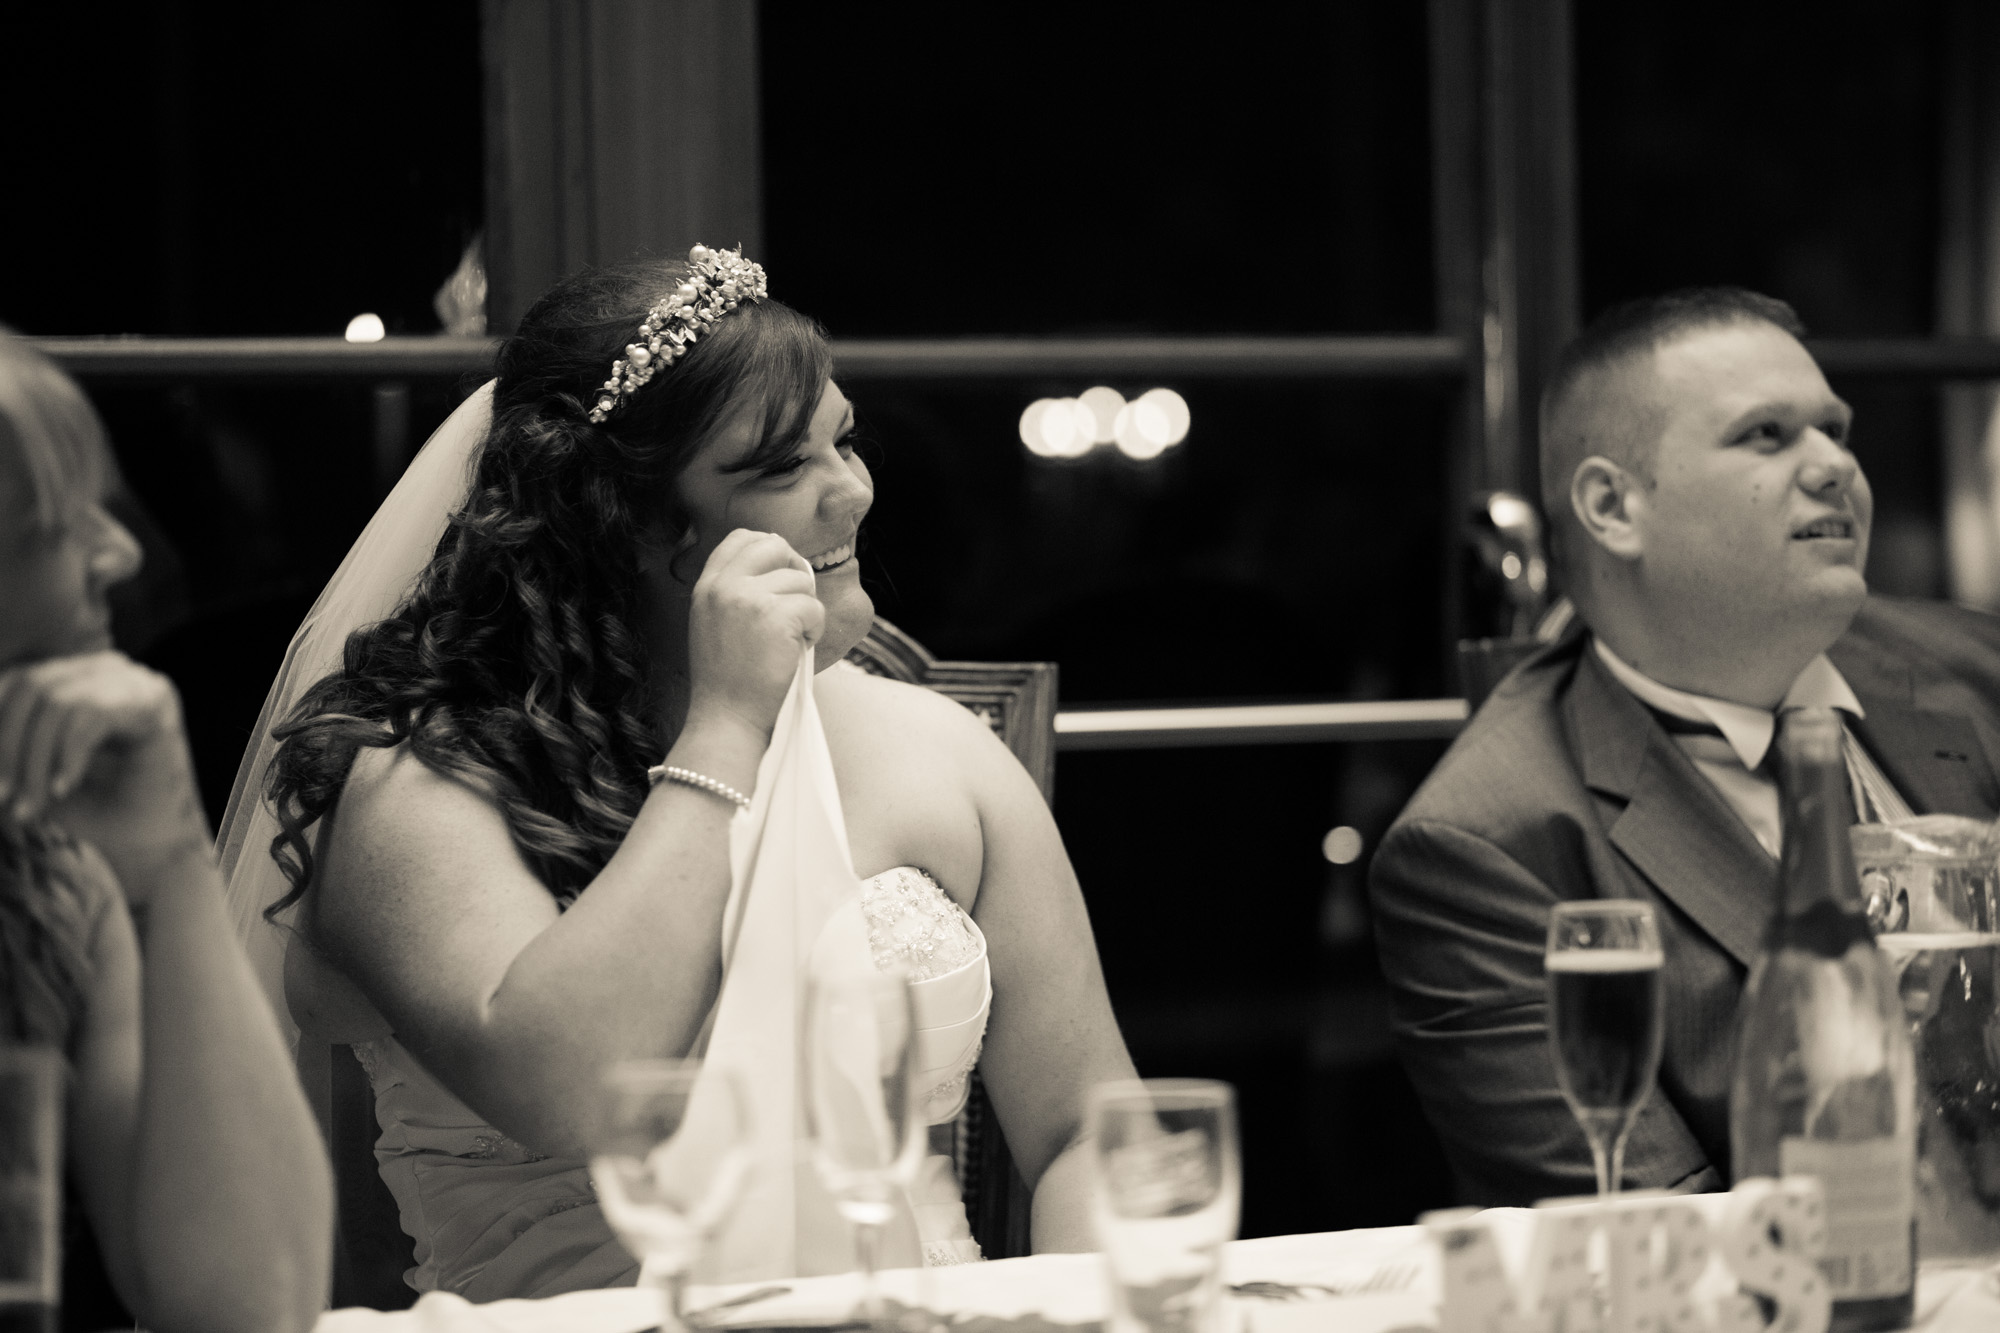 South Wales Wedding Photograher at Craig Y Nos Castle (46)